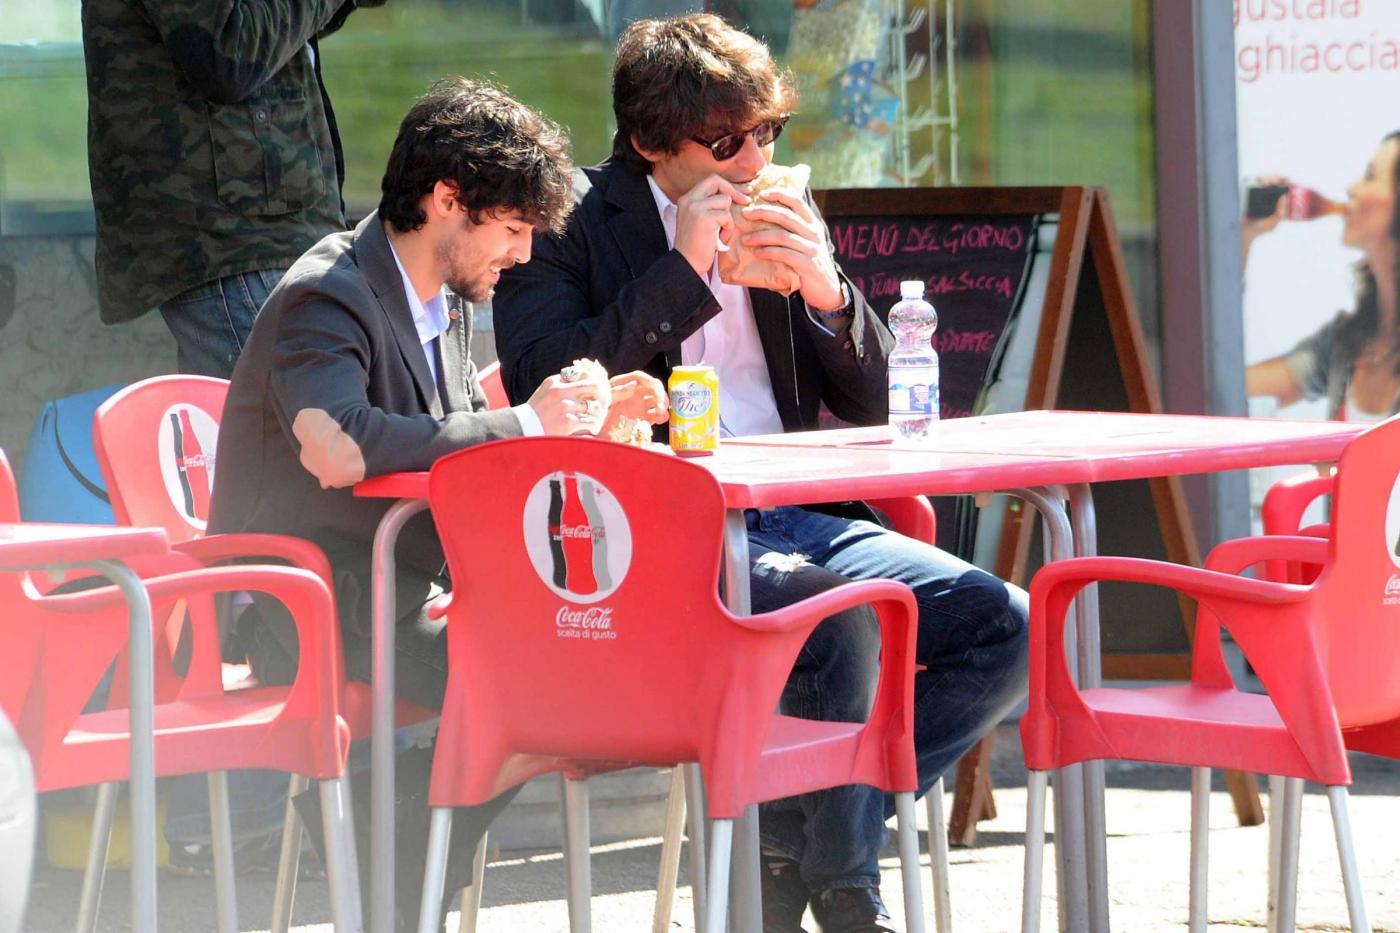 Roma, Simone Corrente e Pablo Espinosa a pranzo04